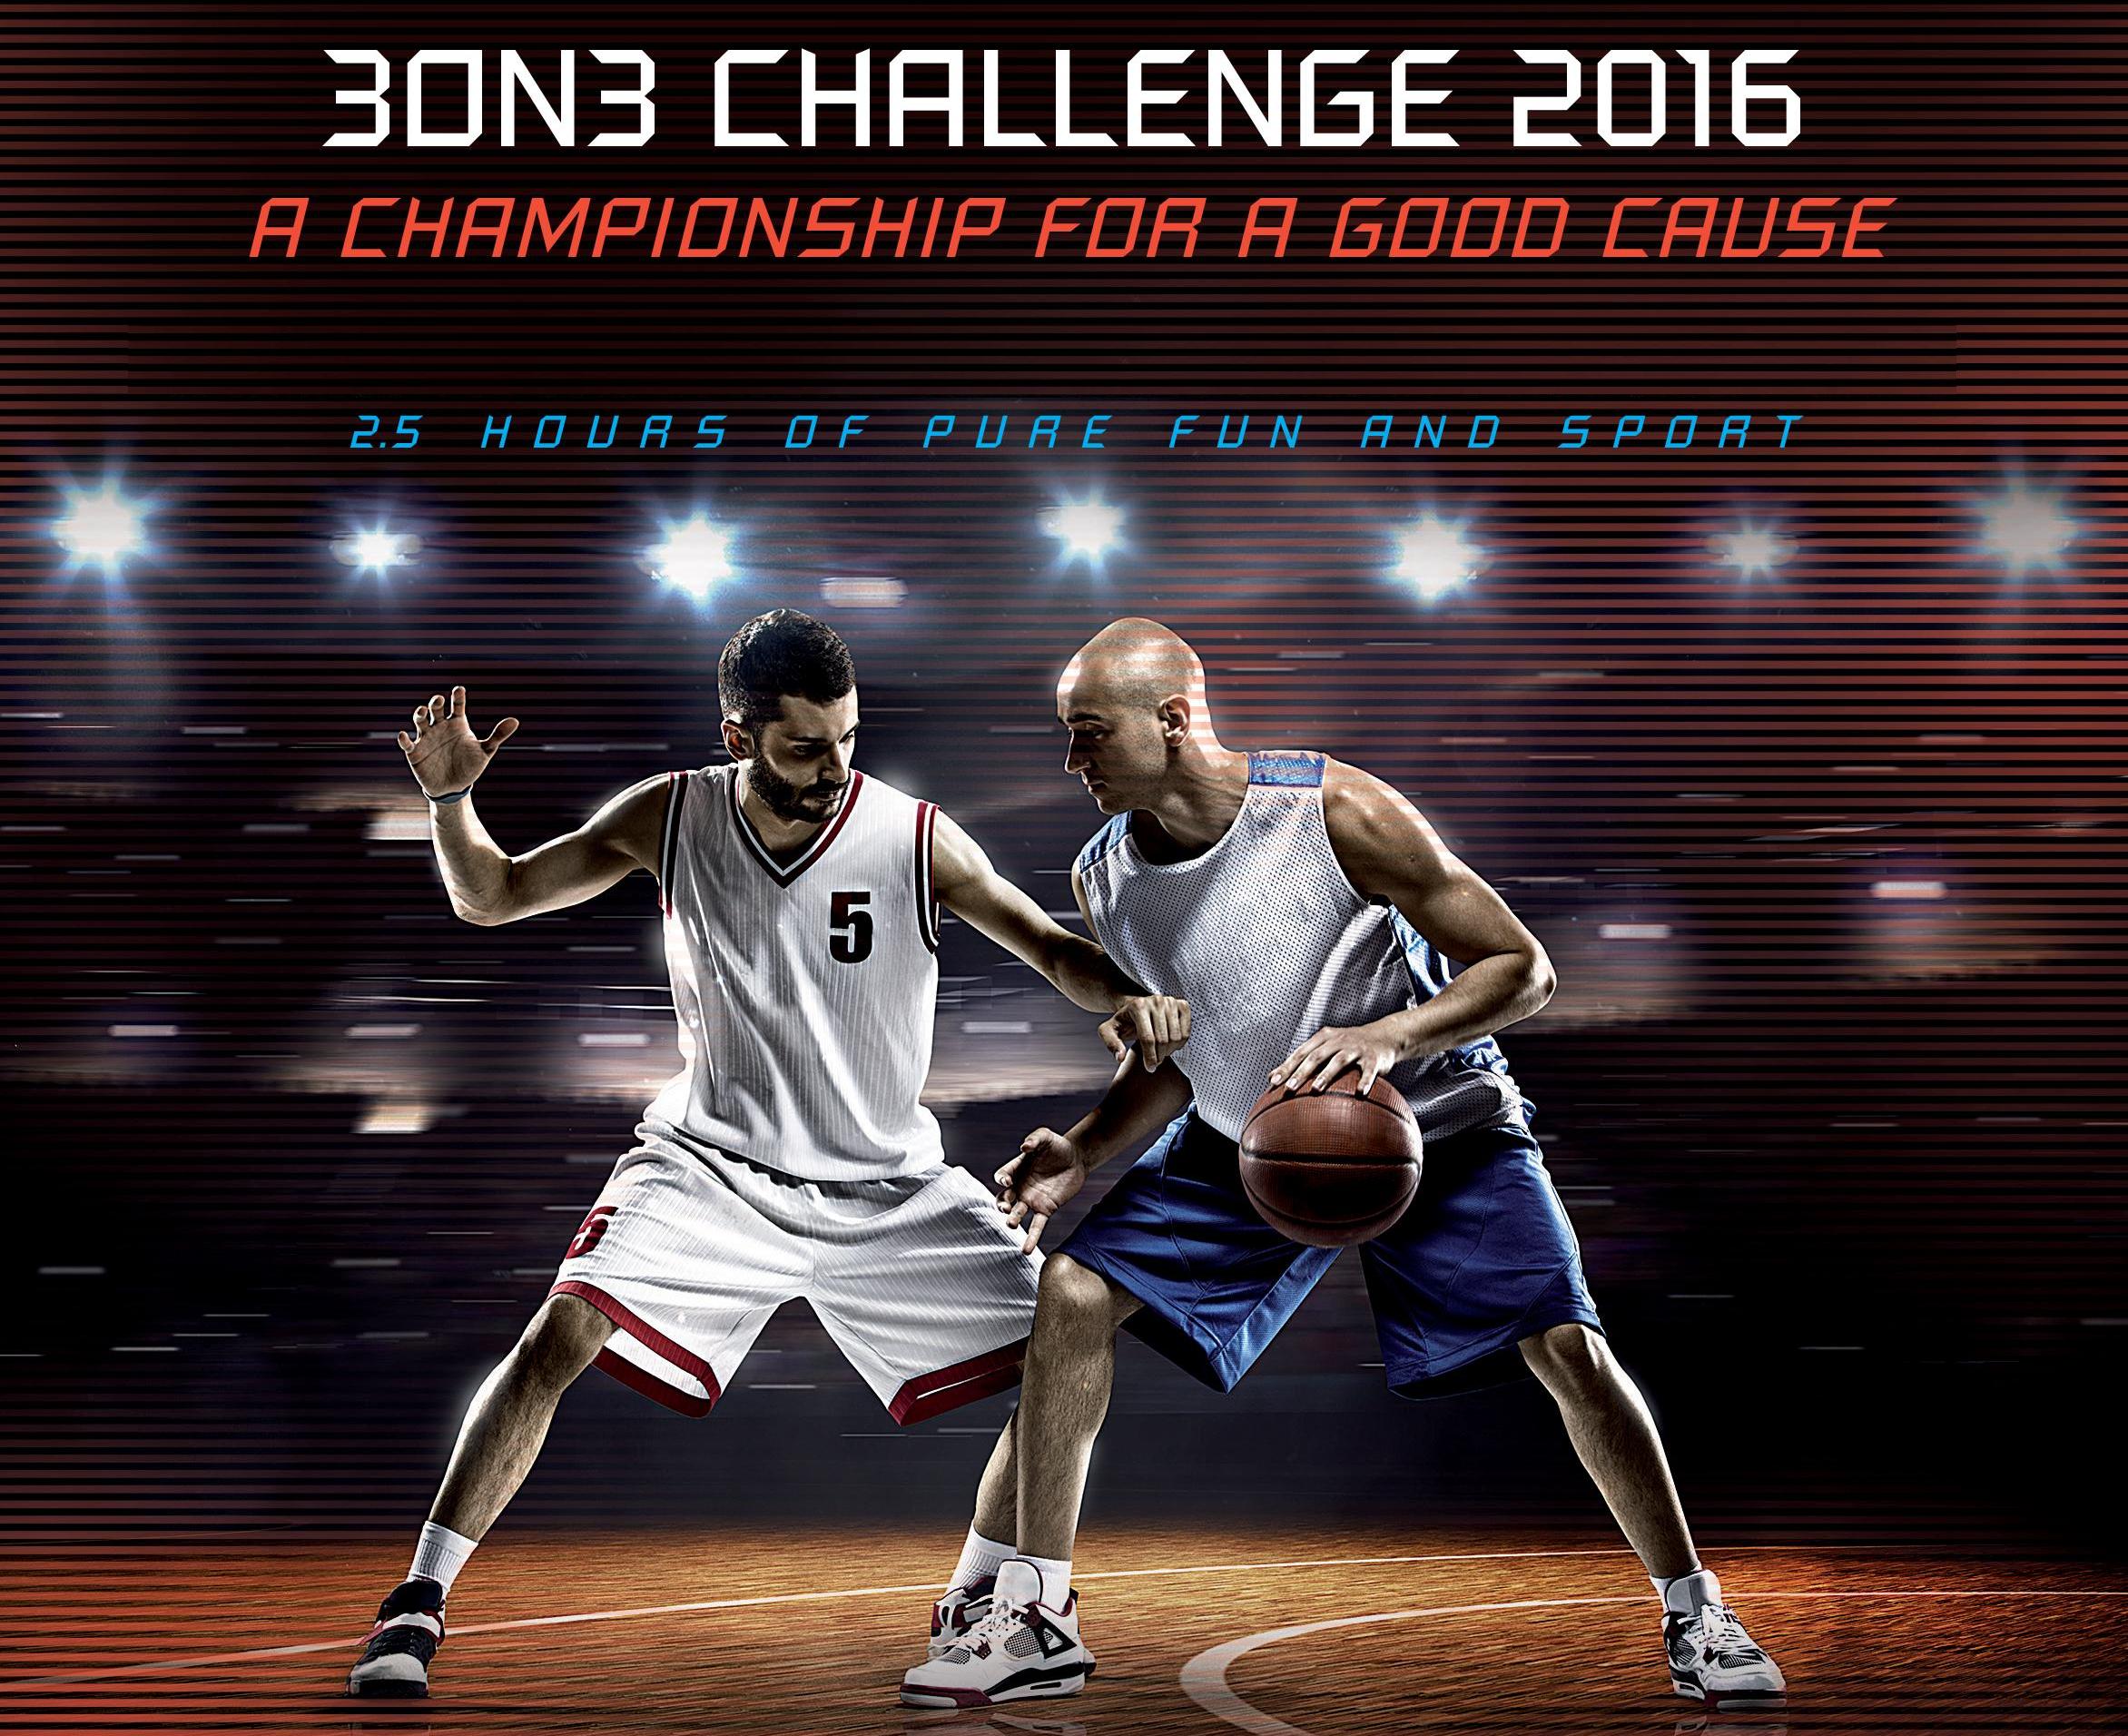 3ON3 Challenge 2016